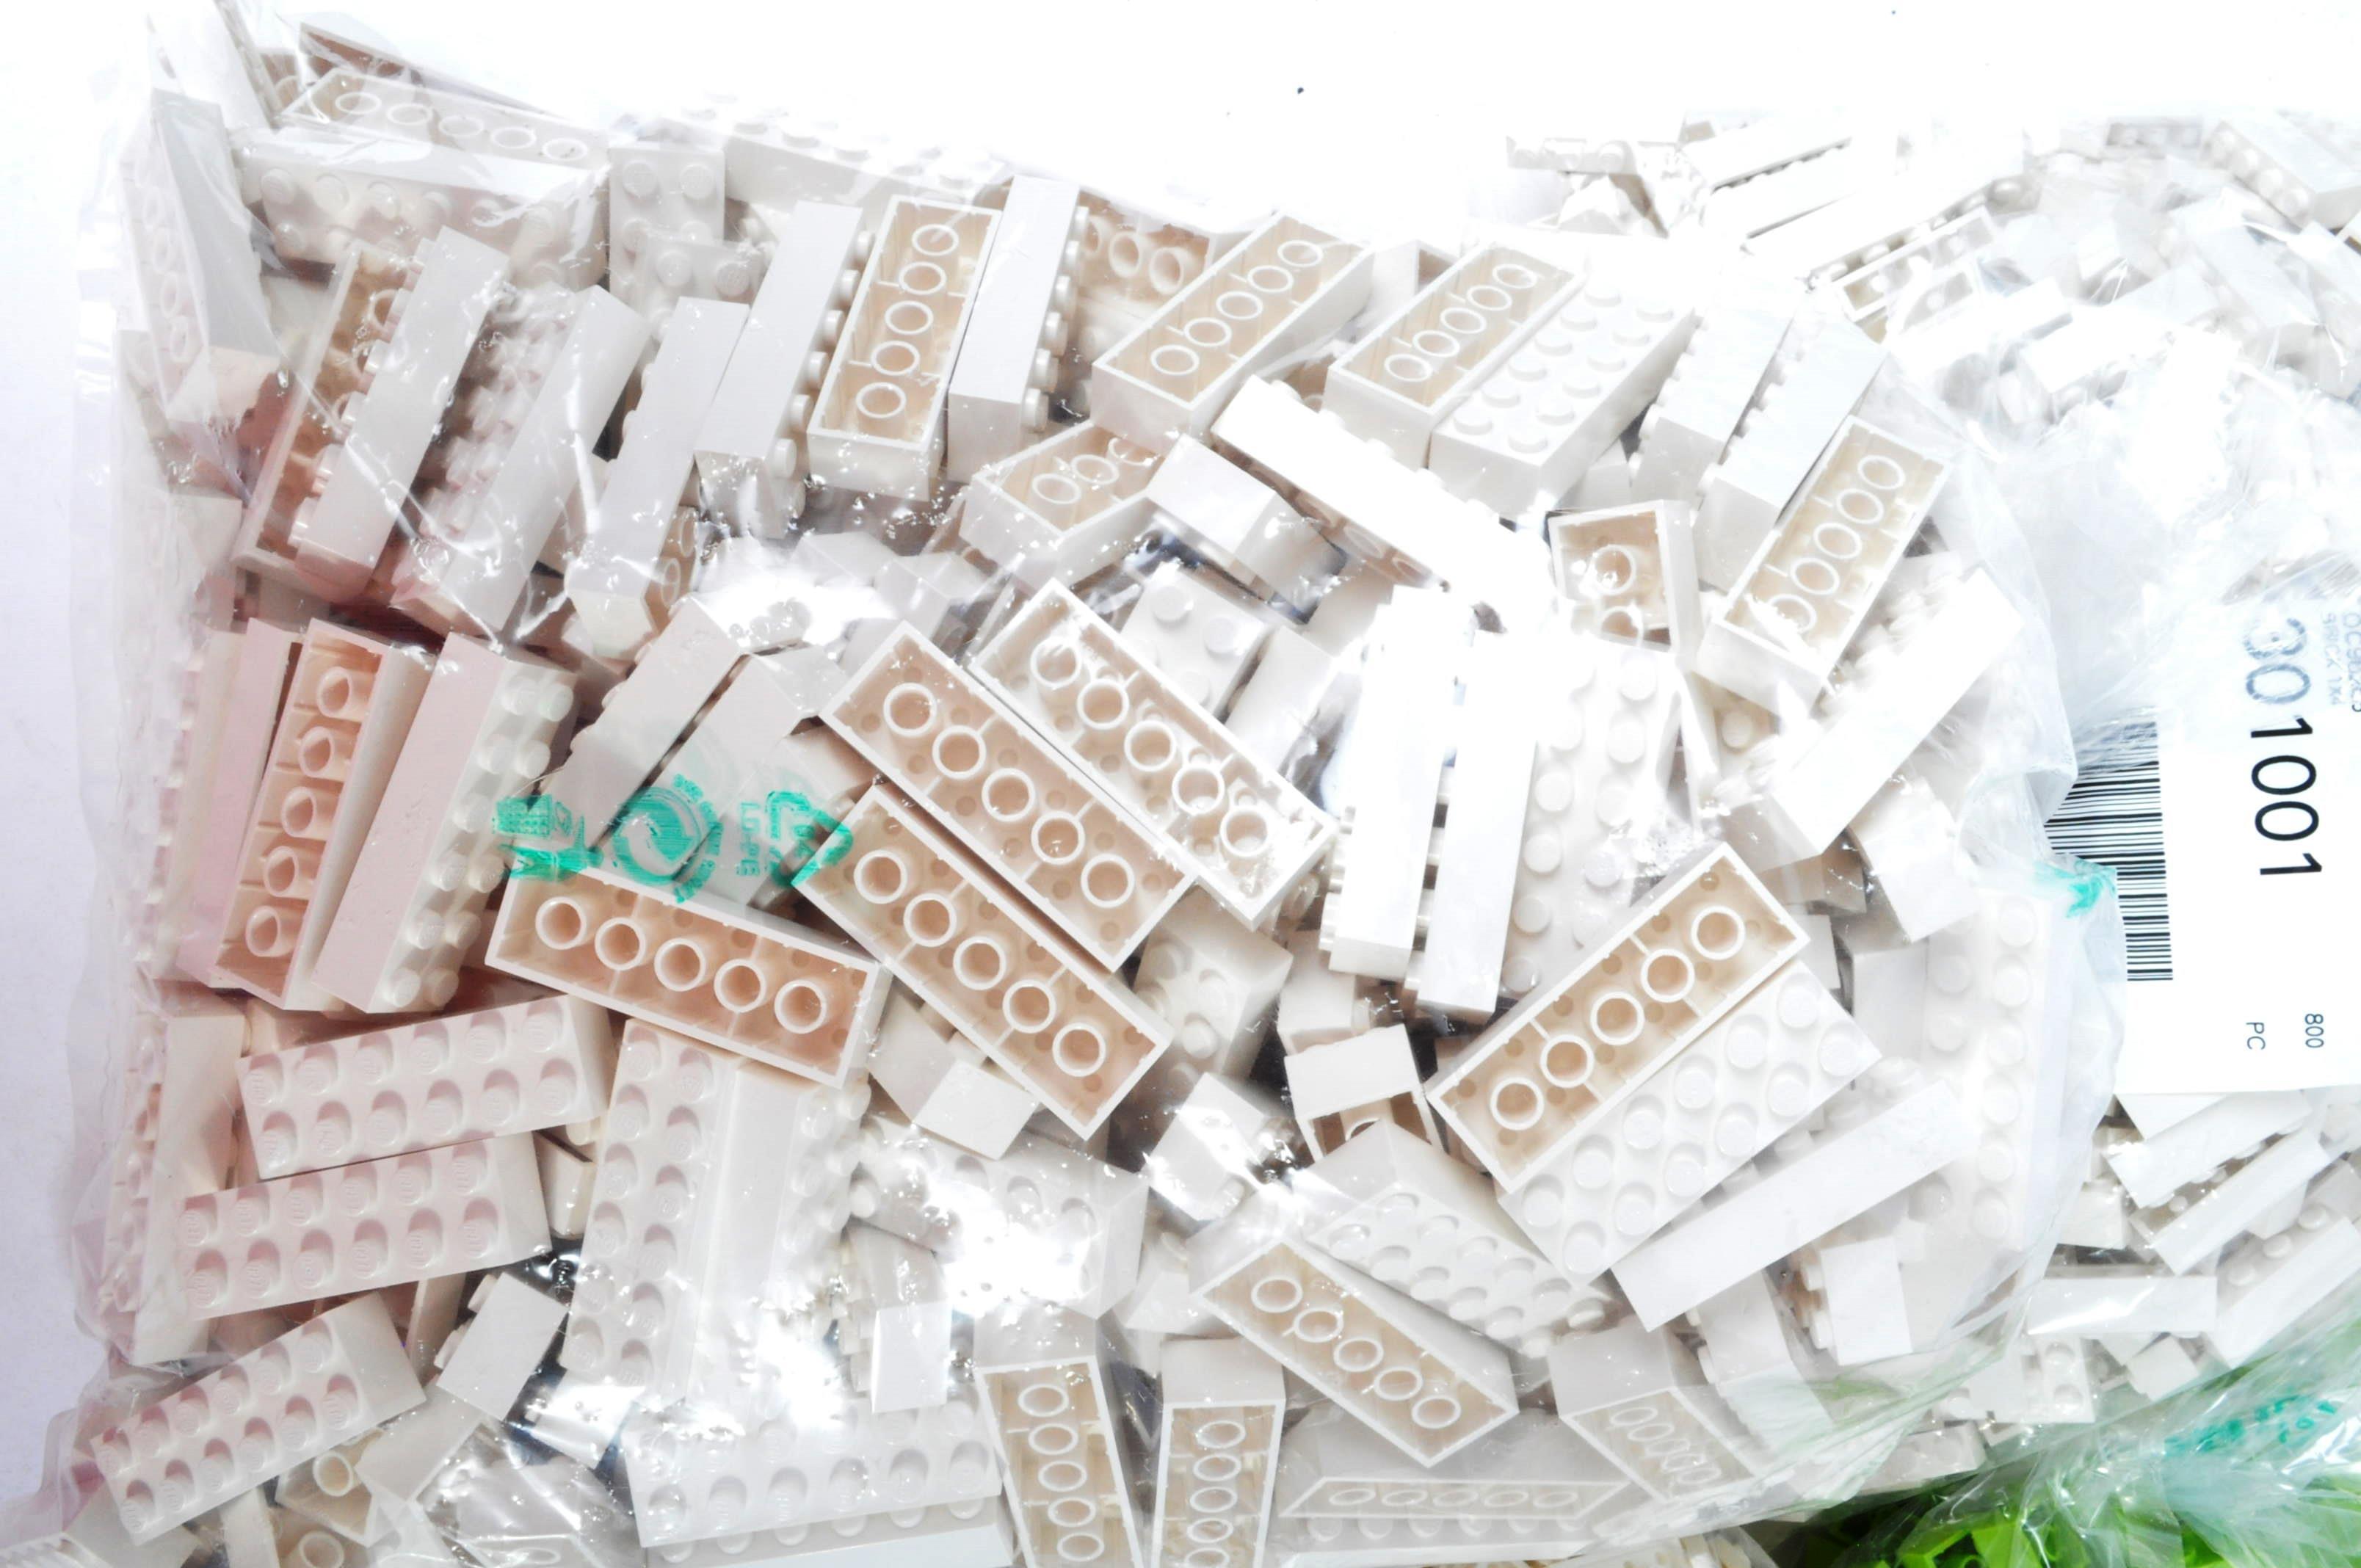 LEGO - 10KG OF BRAND NEW UNUSED LEGO BUILDING BRICKS - Image 2 of 7